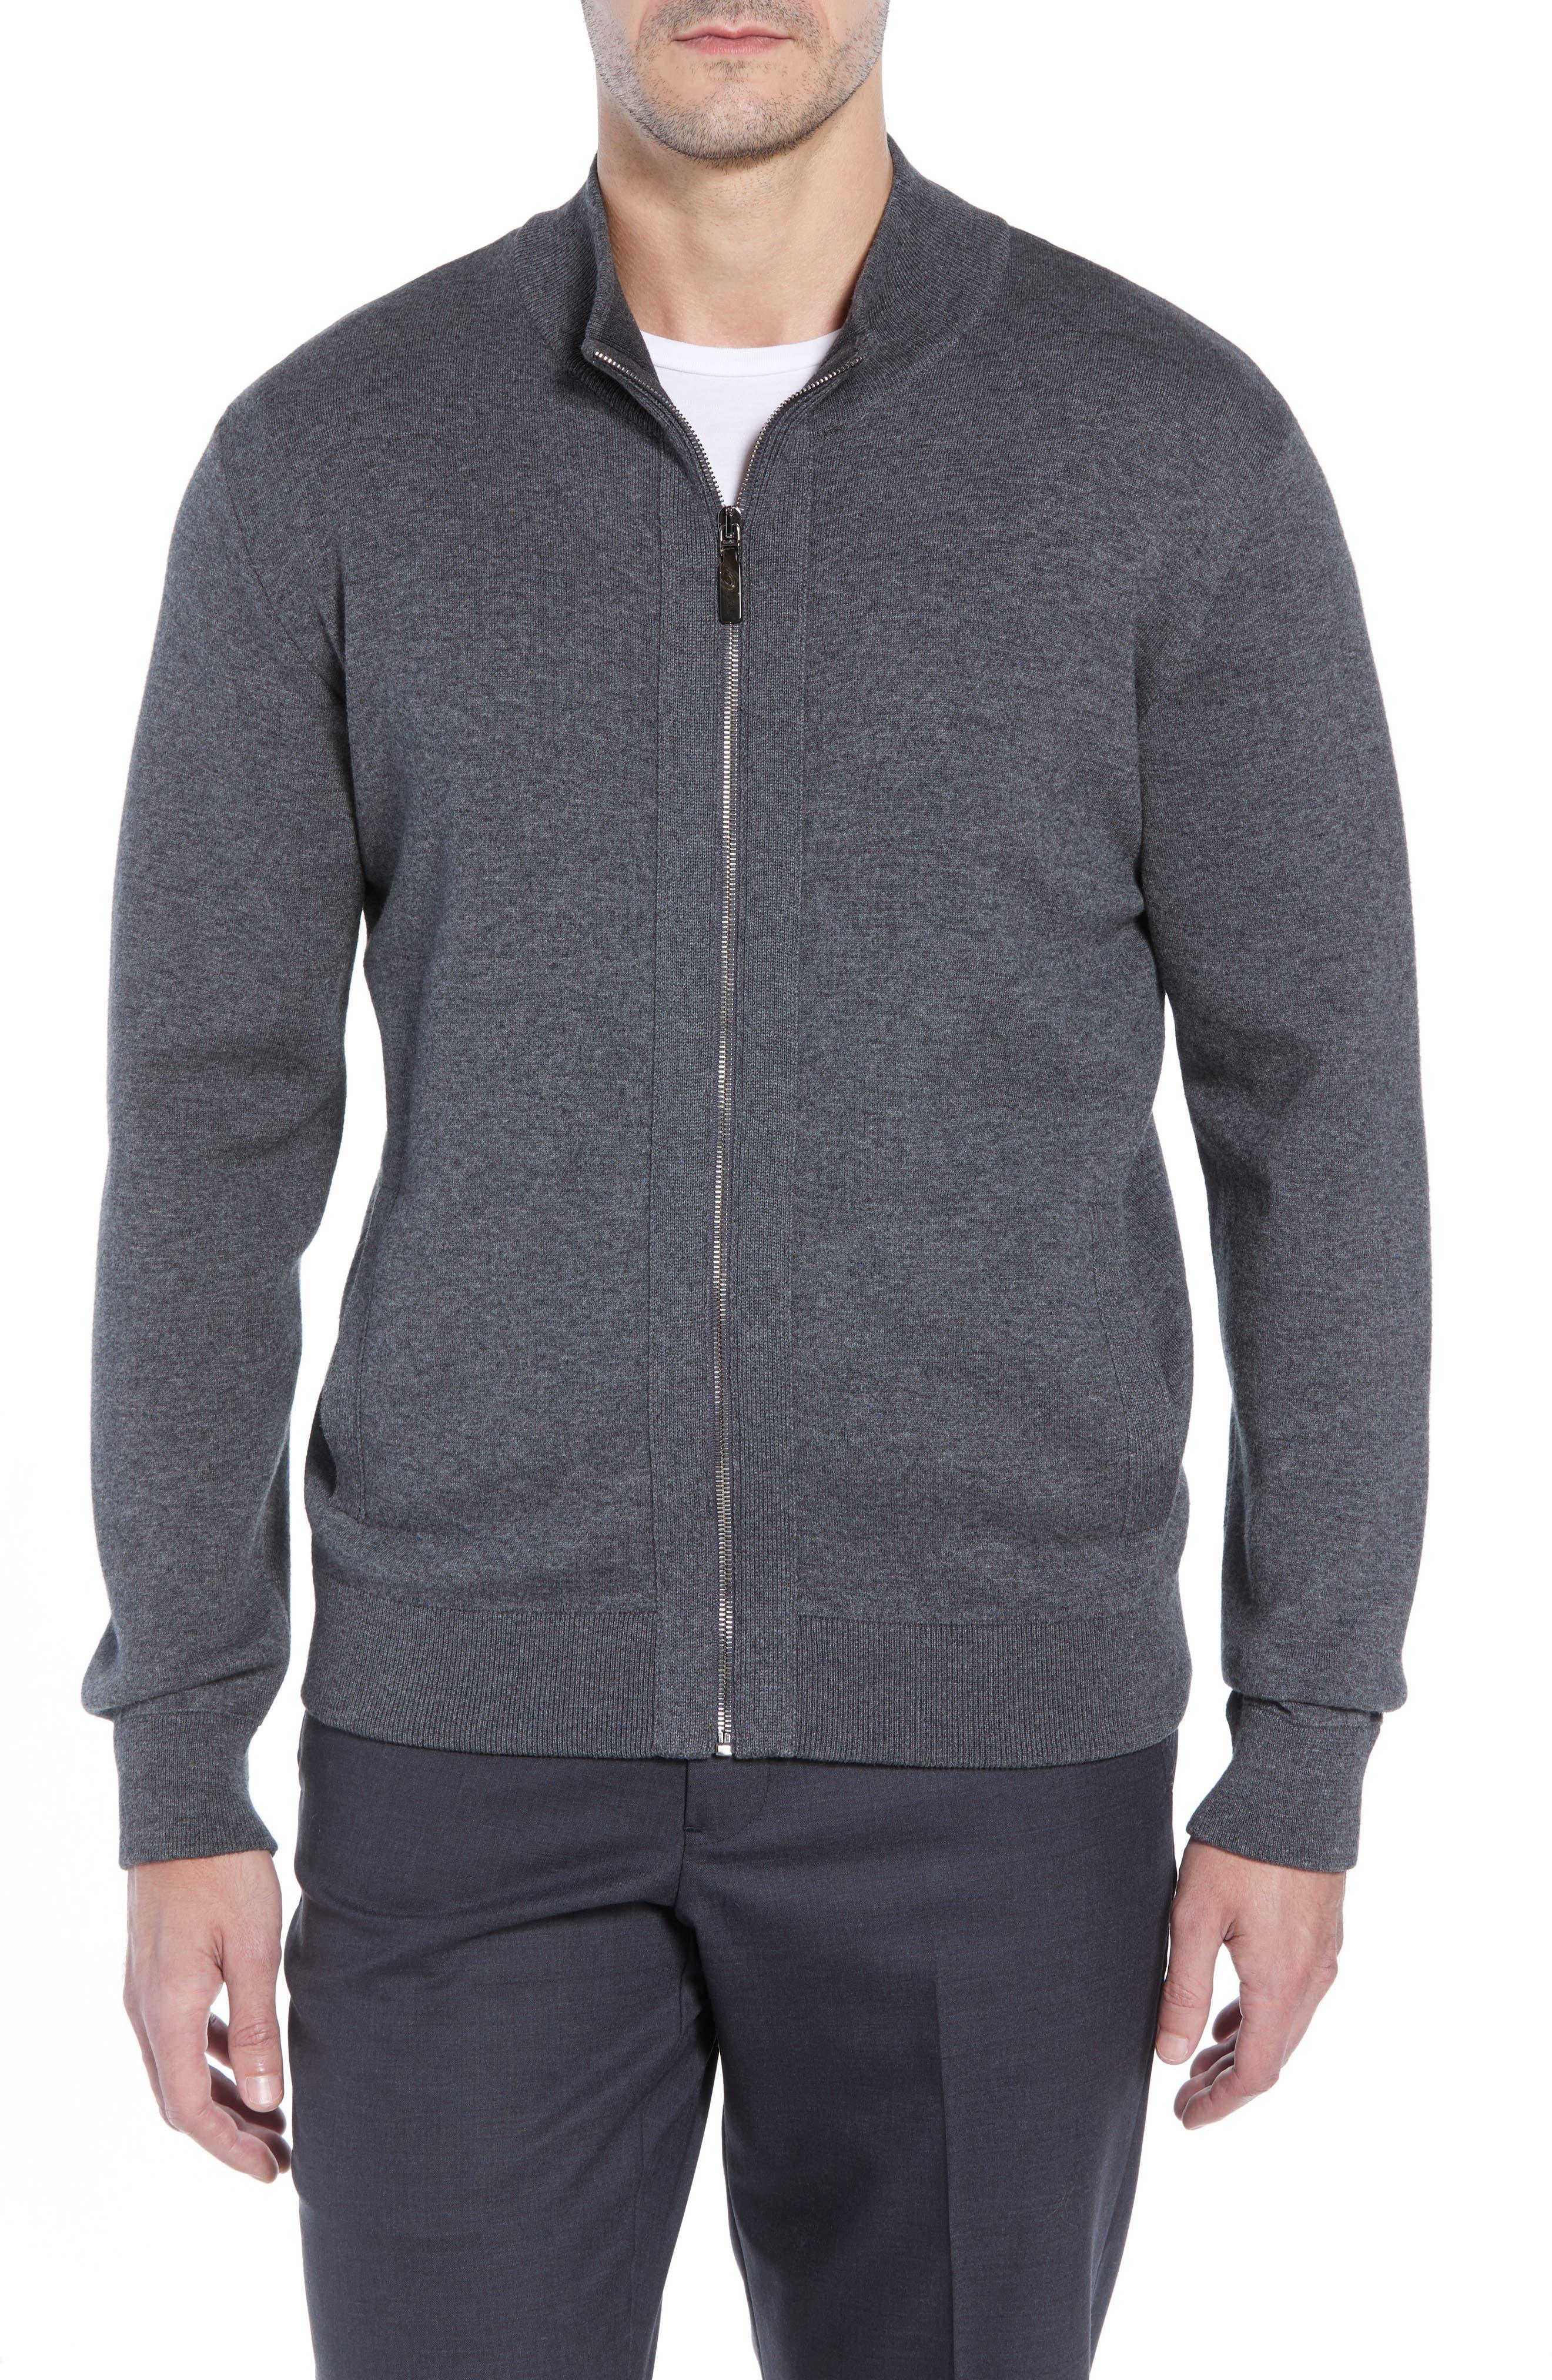 Corneliani Cotton Blend Zip Cardigan, US / 4 - Grey